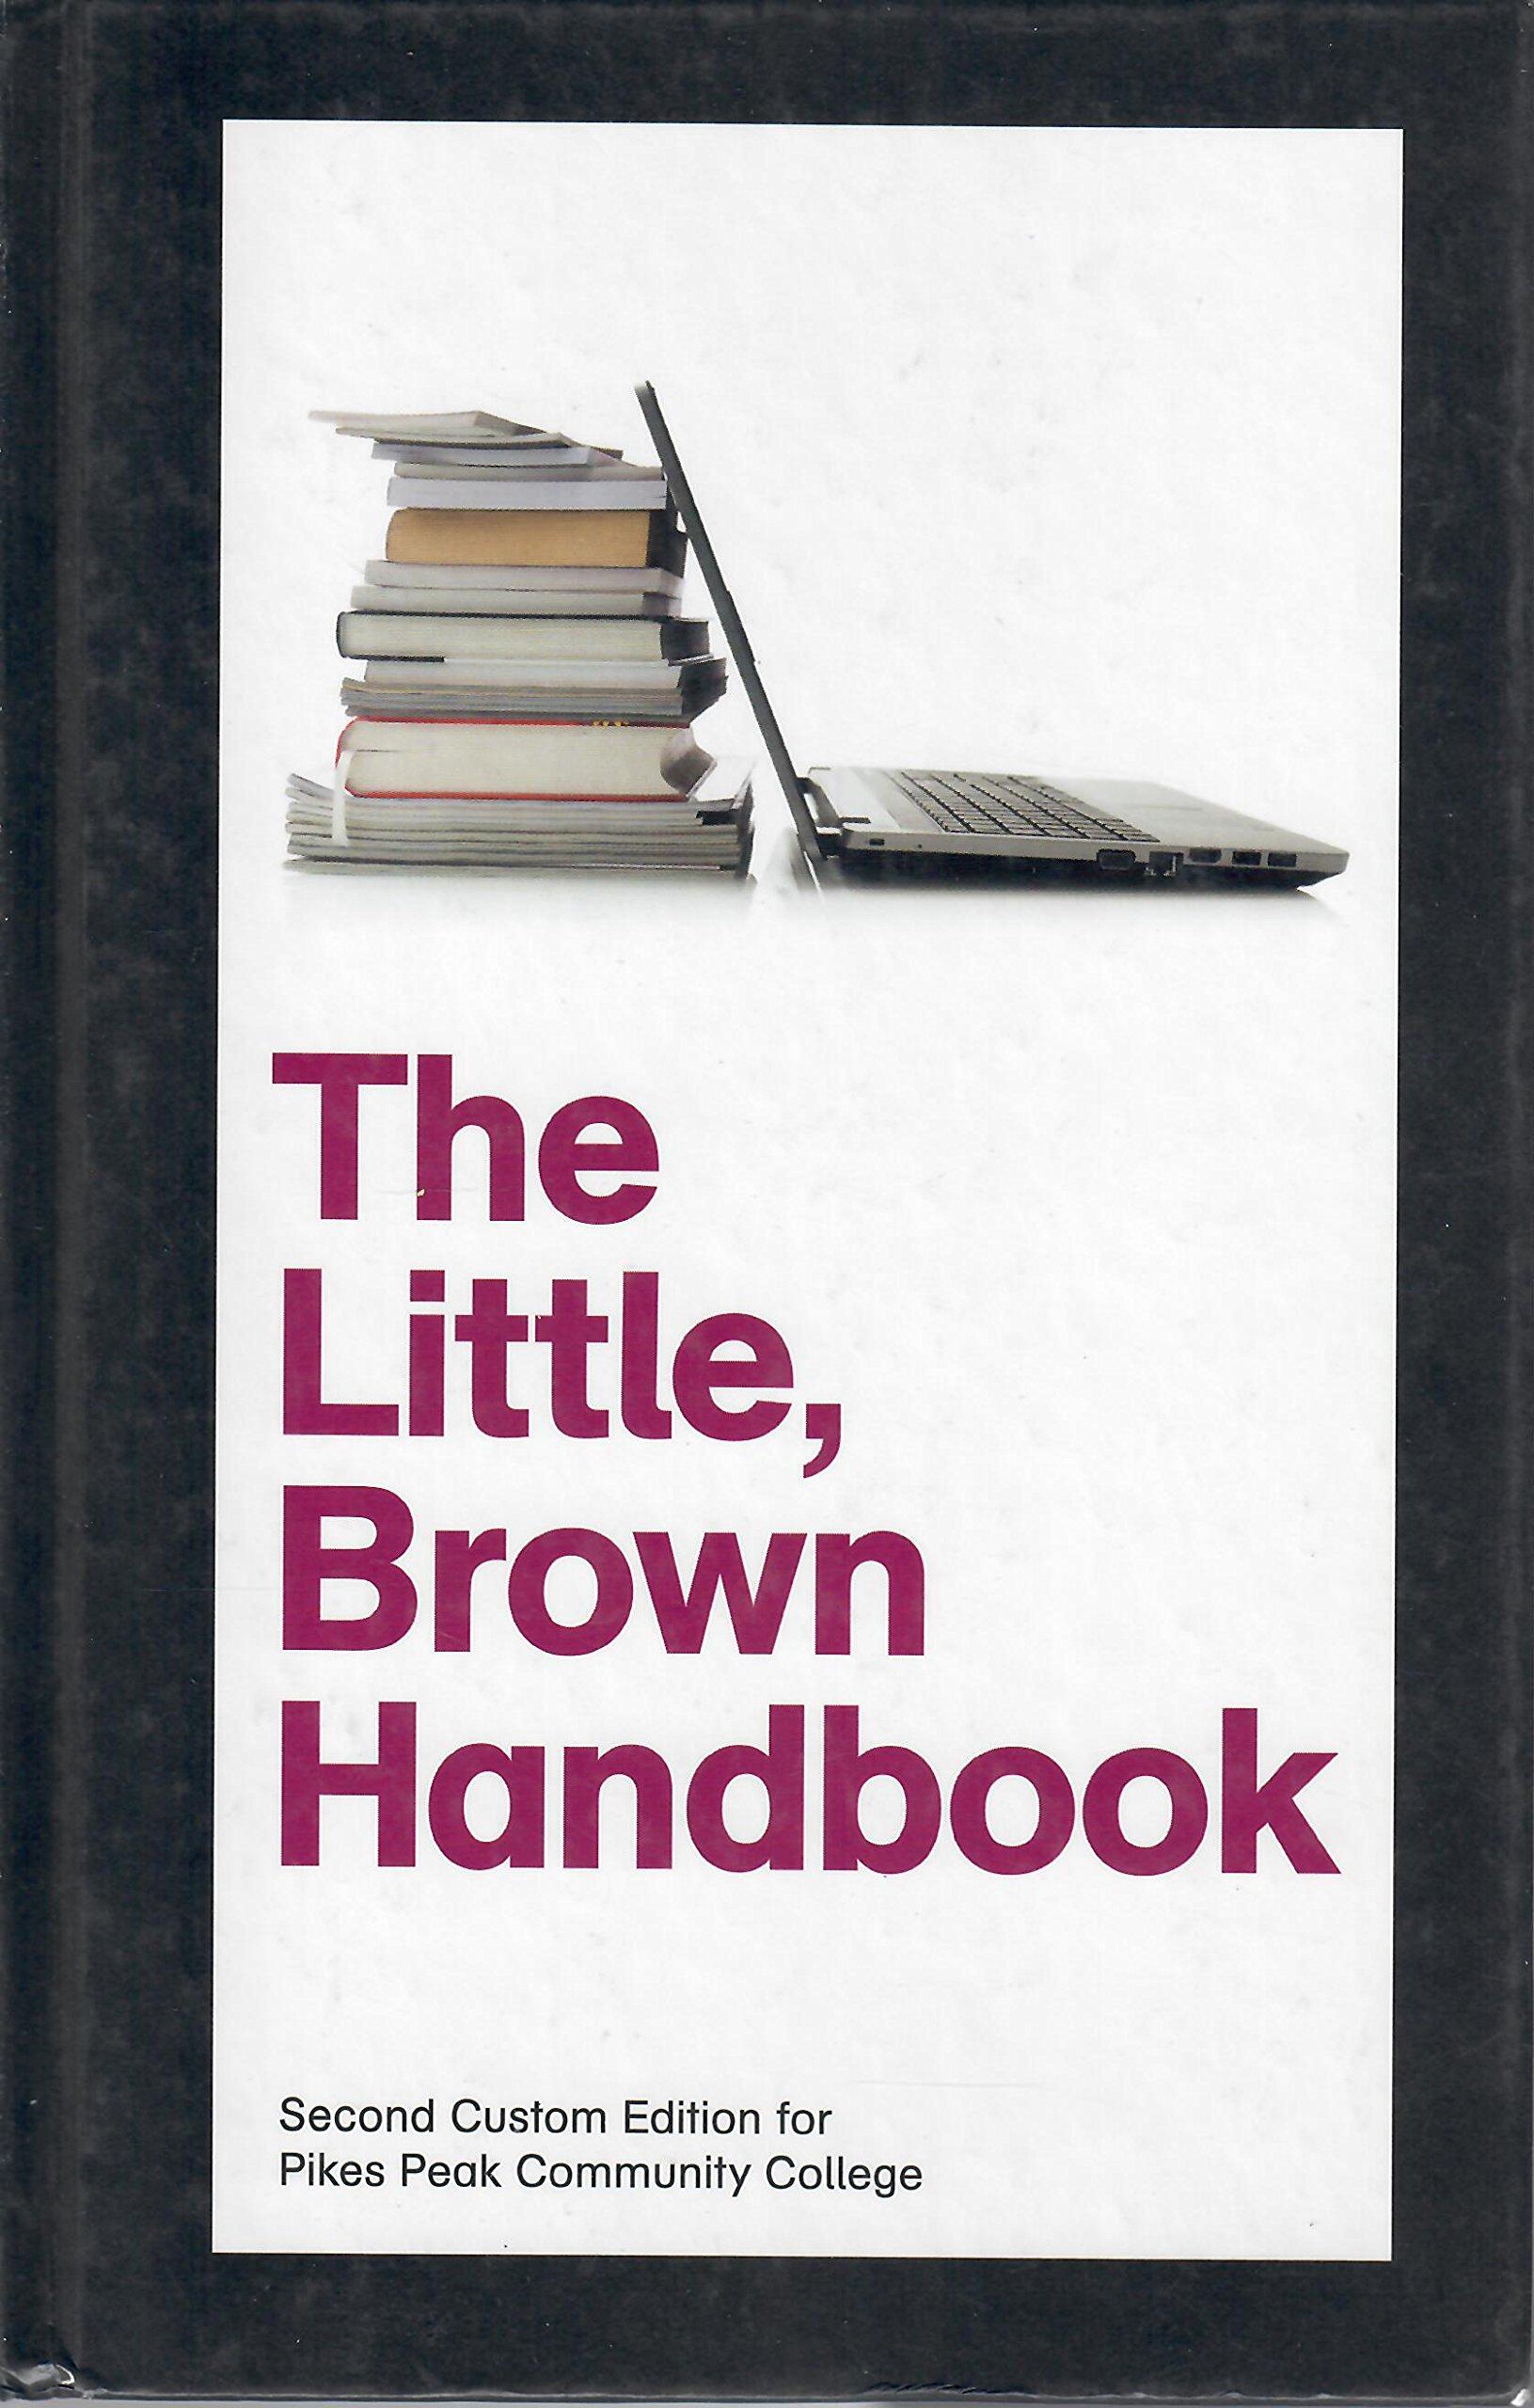 The Little, Brown Handbook, 2nd Custom Edition for Pikes Peak Community  College: H. Ramsey Fowler, Jane E. Aaron: 9781269421898: Amazon.com: Books